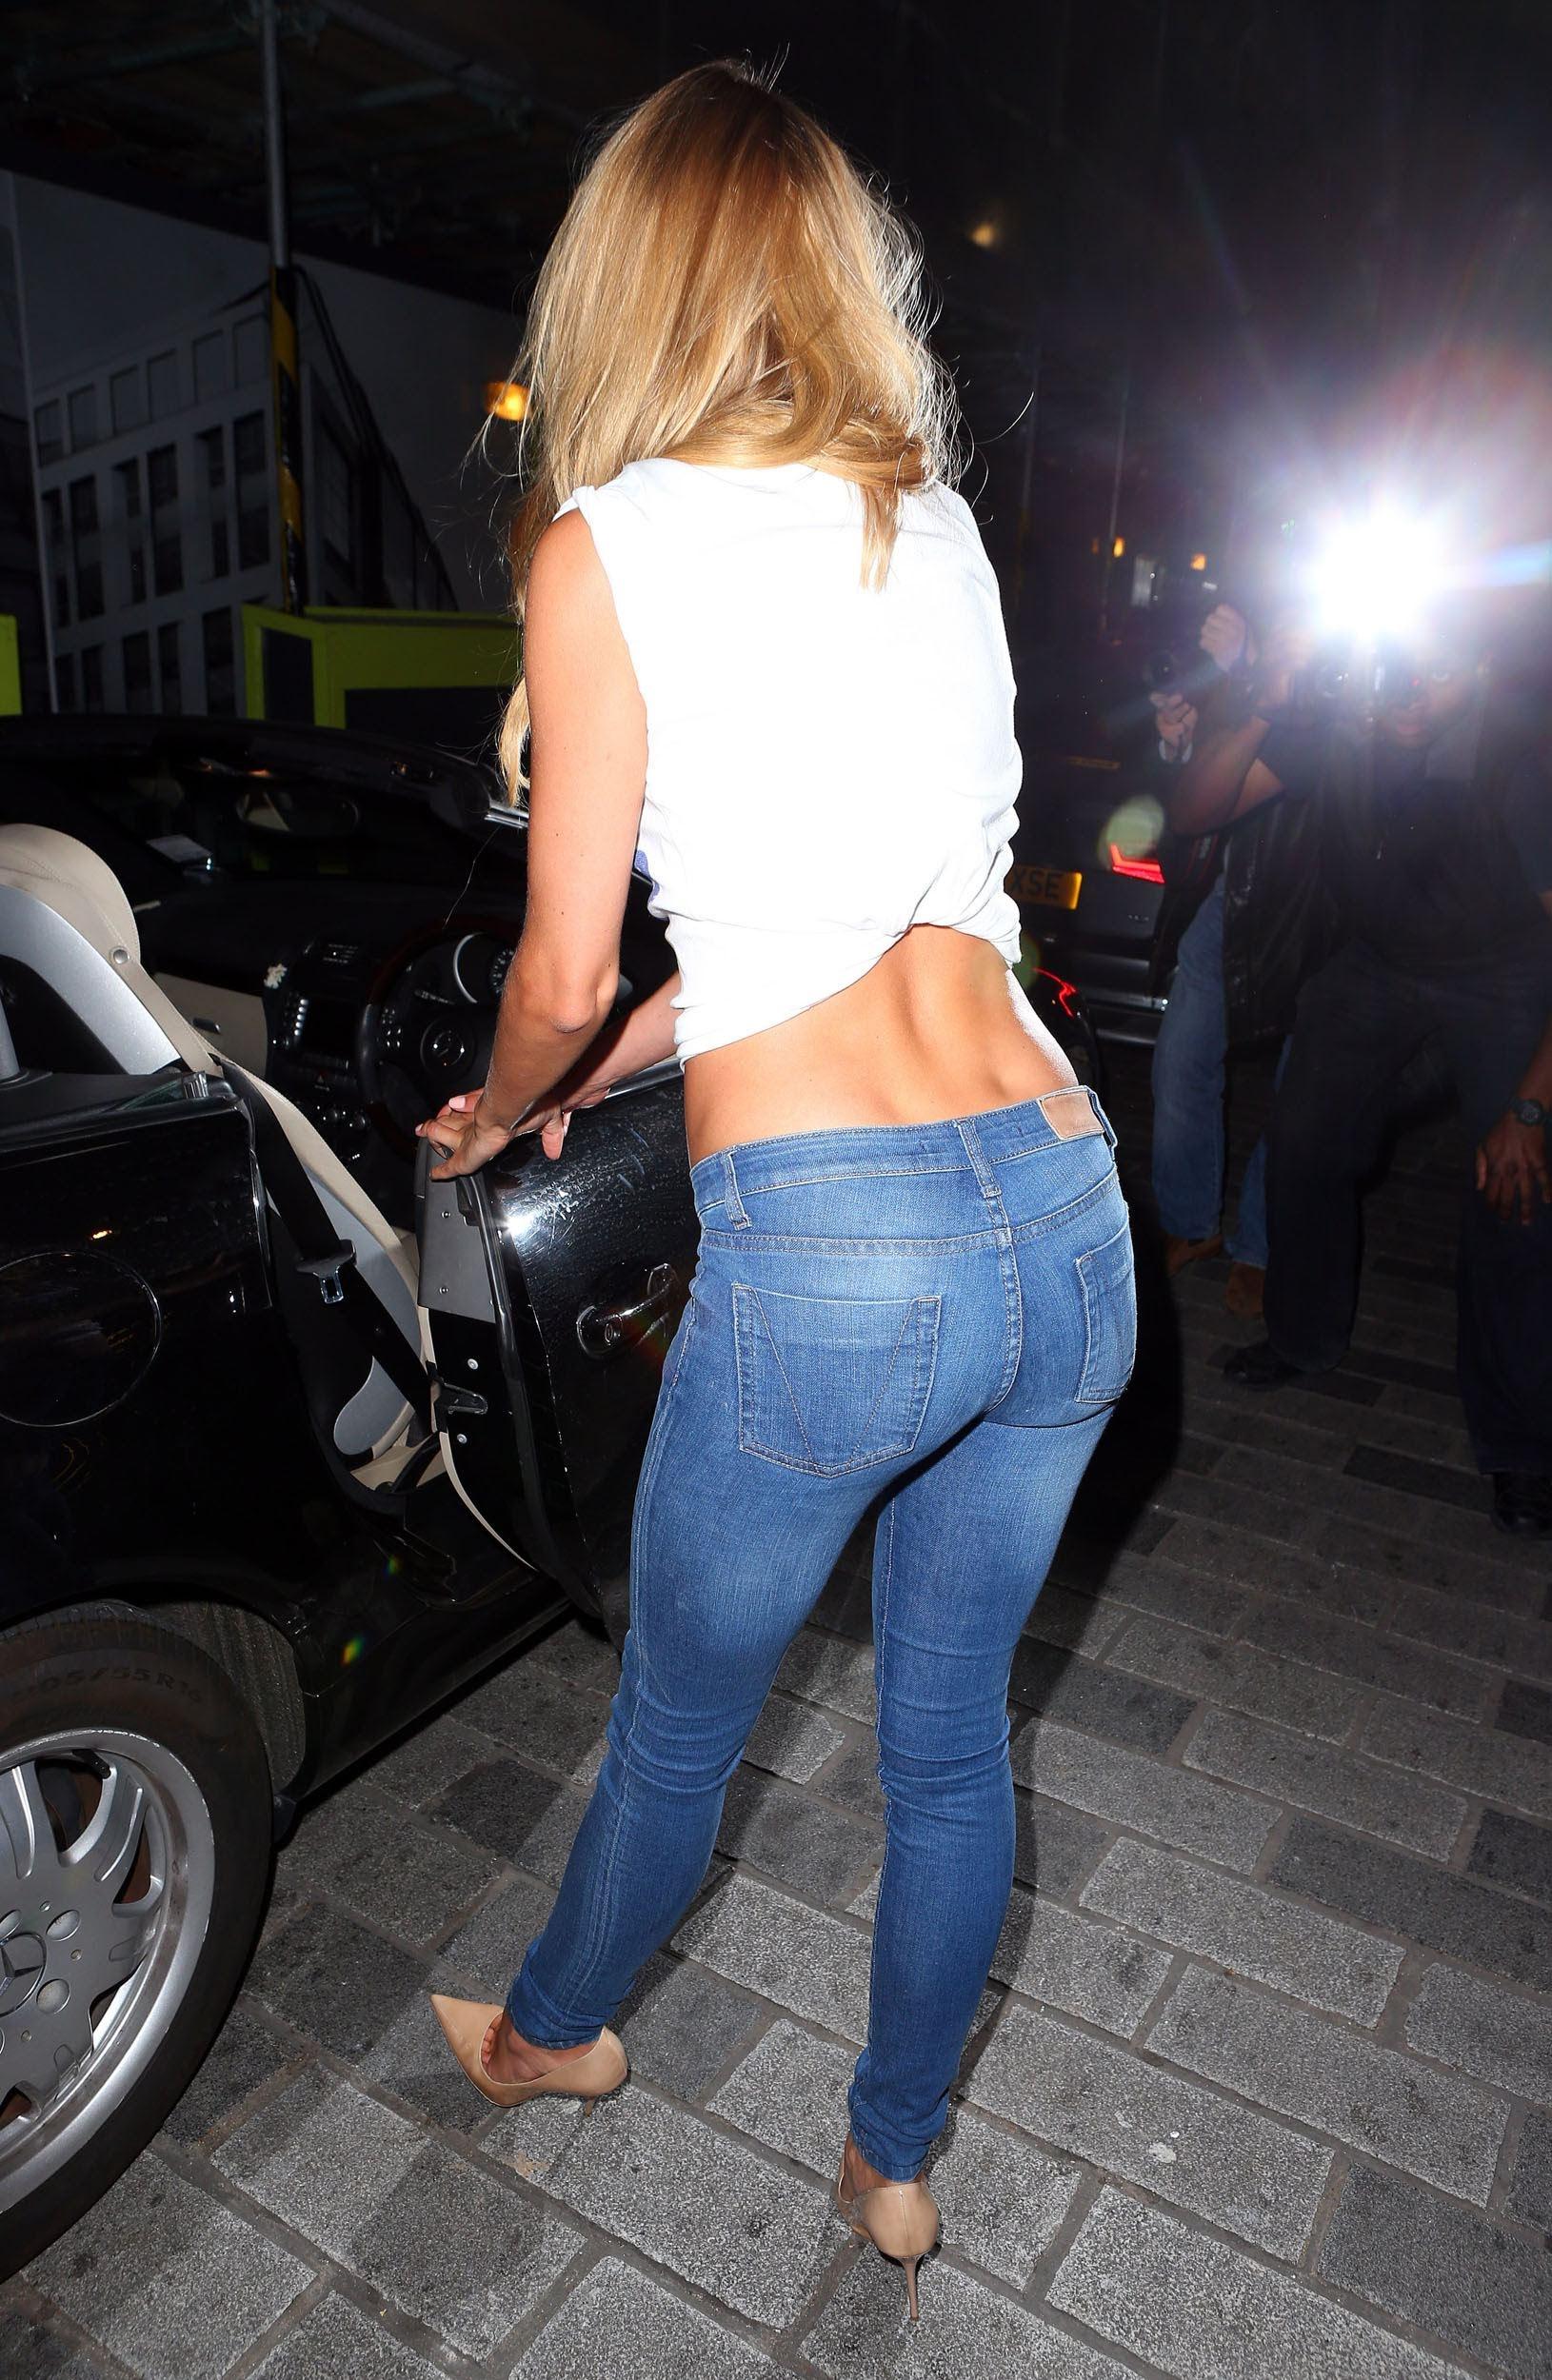 Fotos em HQ : Kimberley Garner : Jeans for Genes 2013 - Jewel Bar em ...